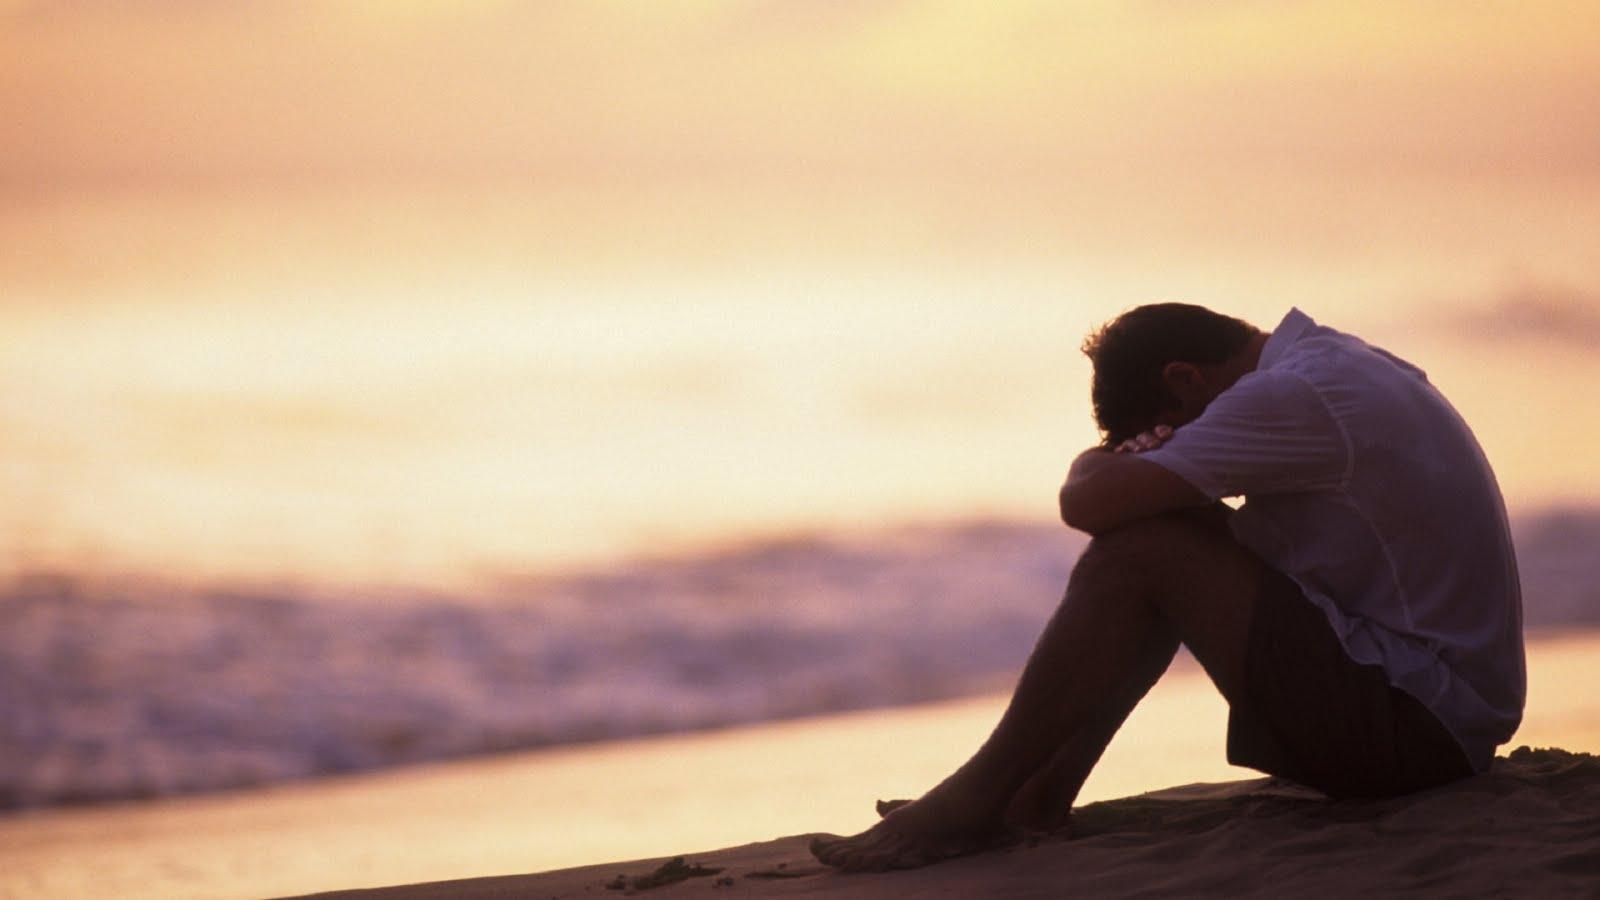 بالصور صور رجل حزين , لقطات لرجل حزين 1768 8